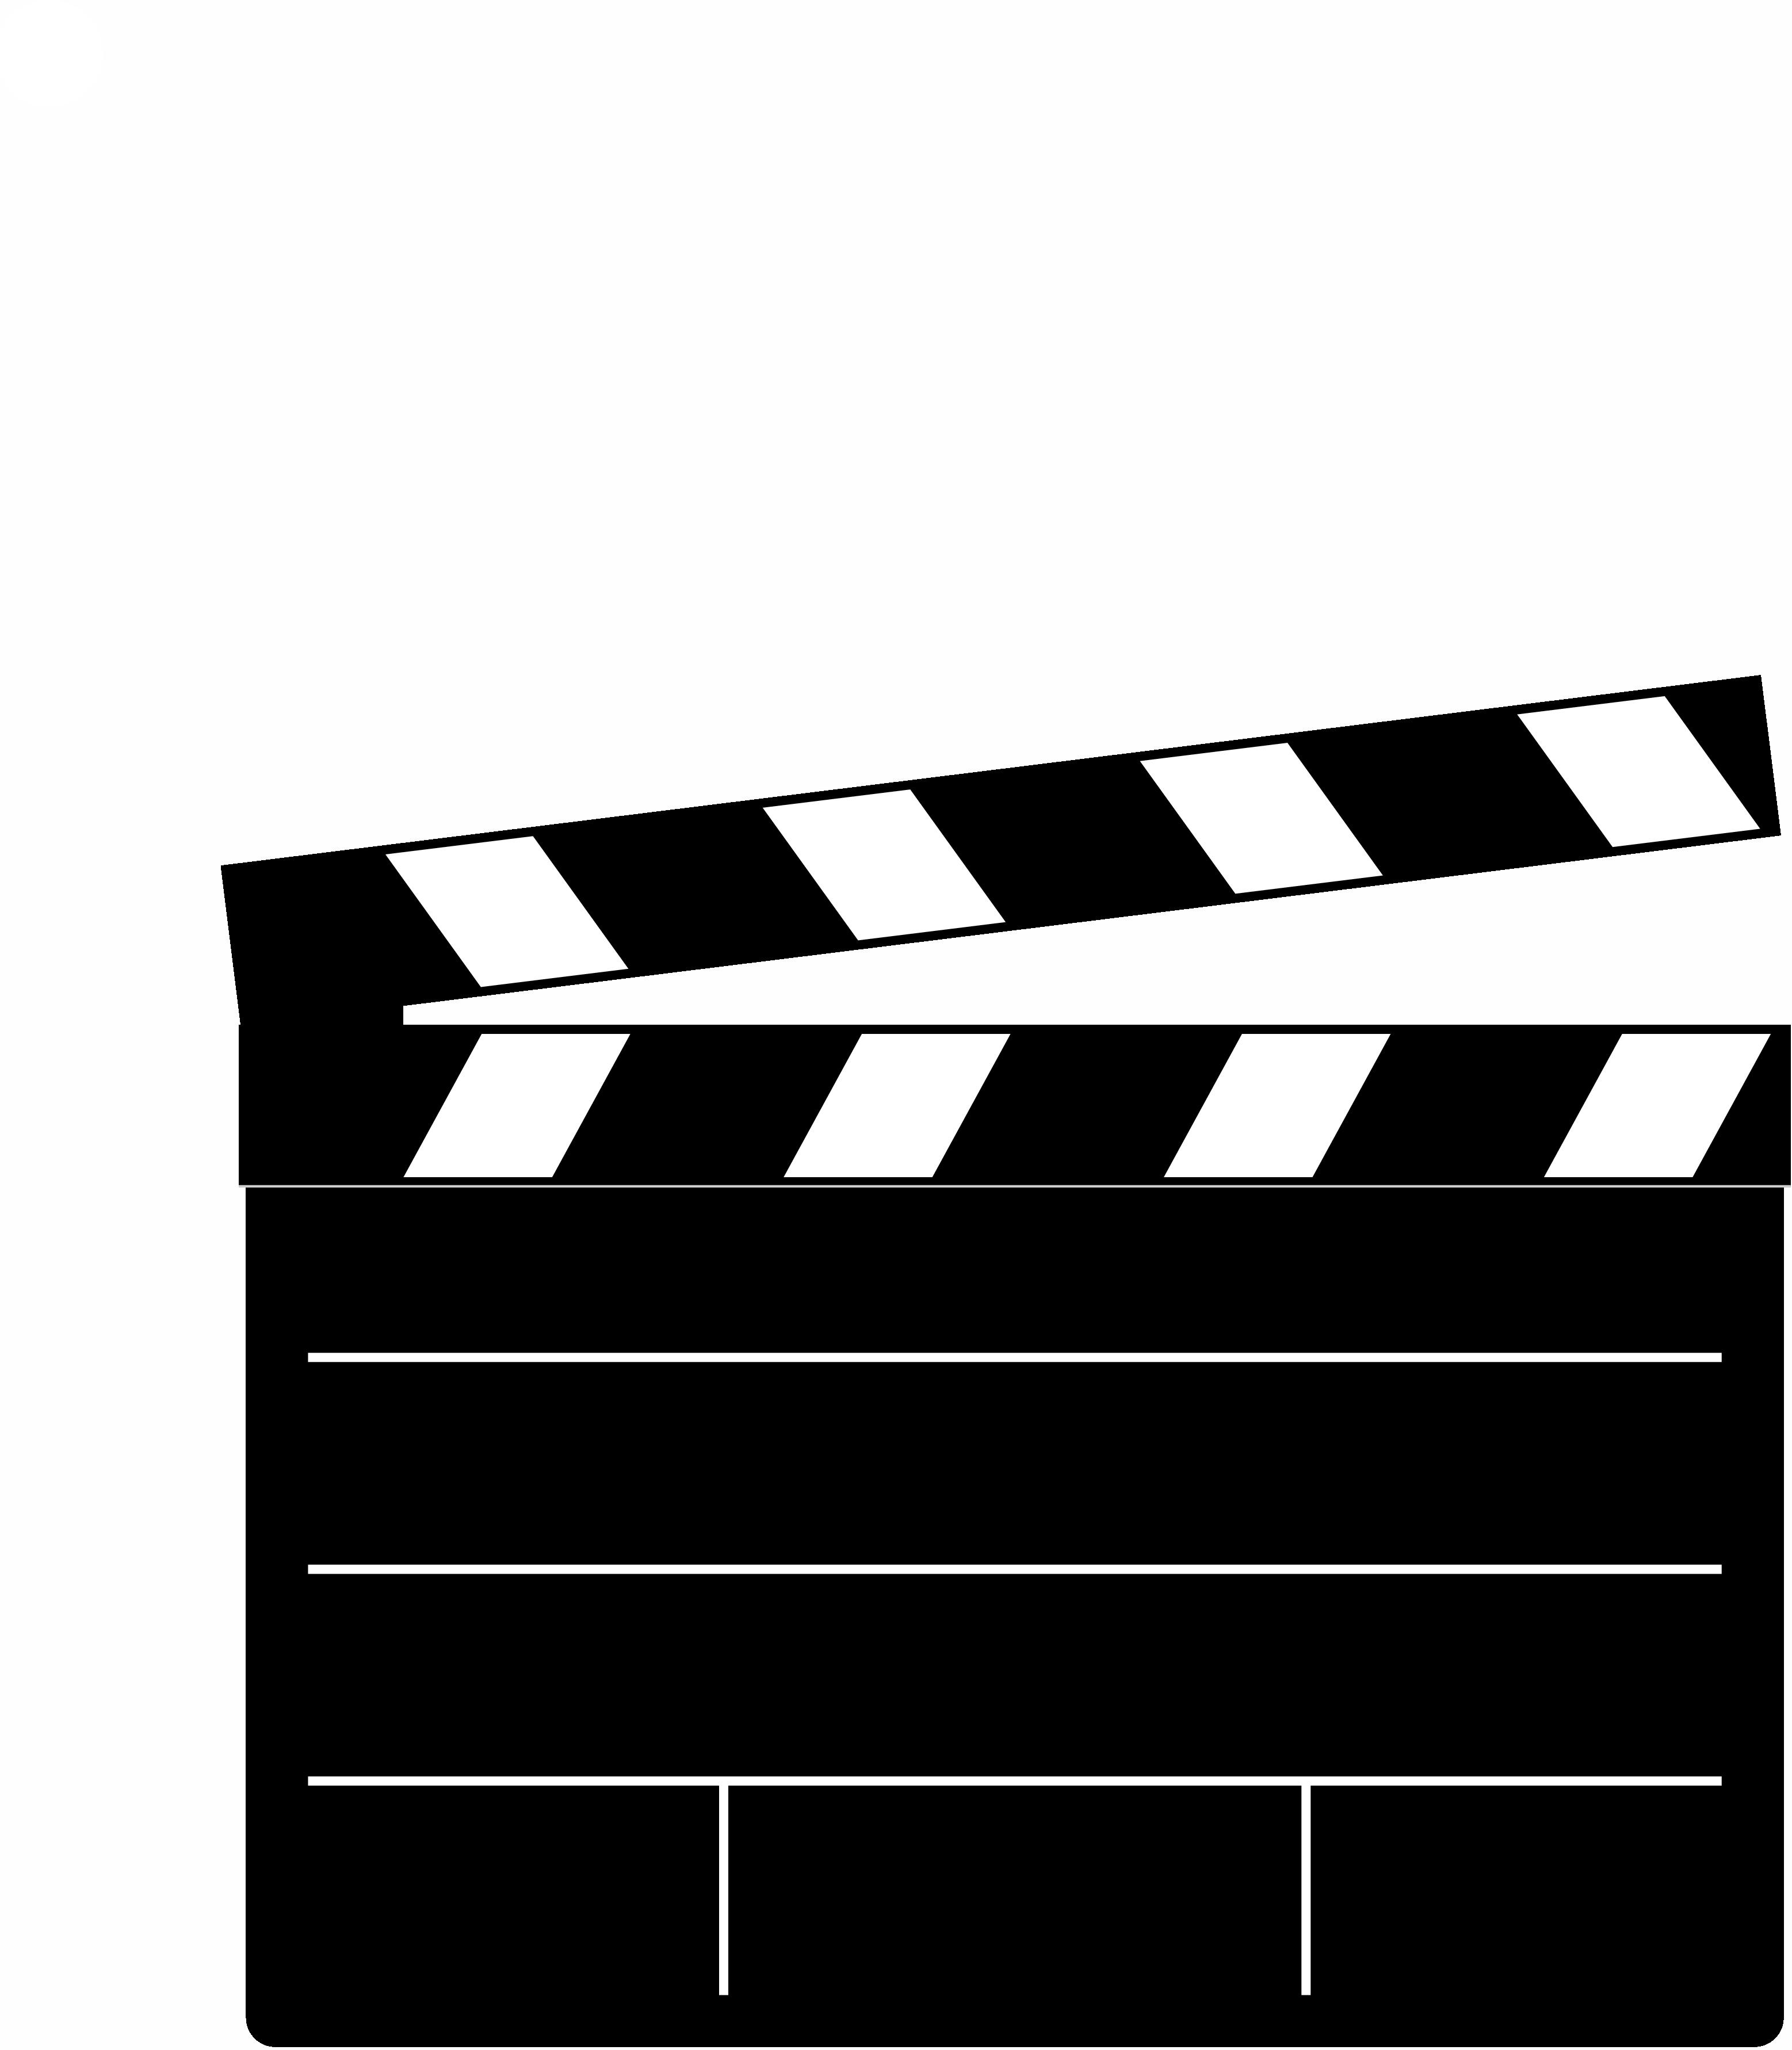 Action clipart transparent. Clapperboard png images pluspng